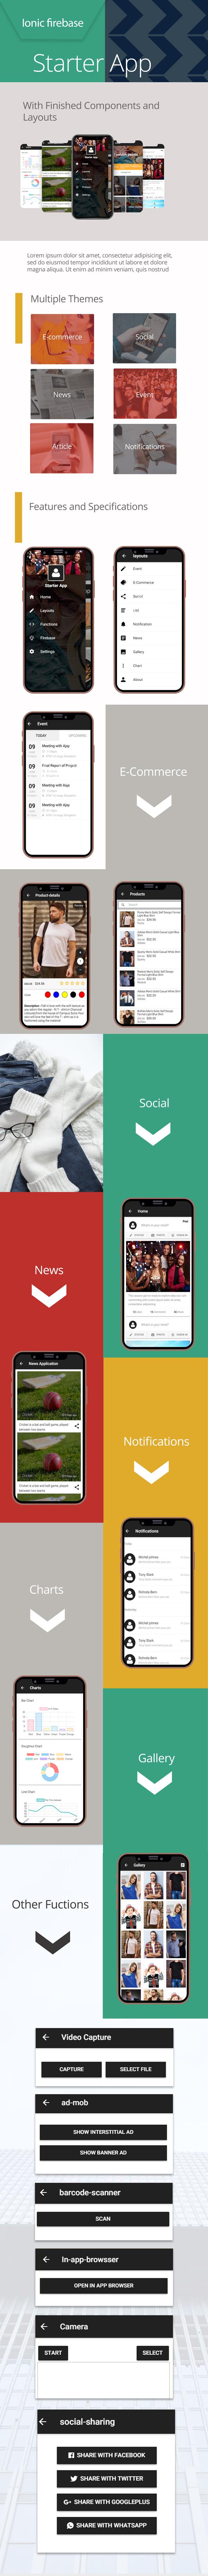 Ionic 3 UI/UX Multipurpose Theme/Template App - 2